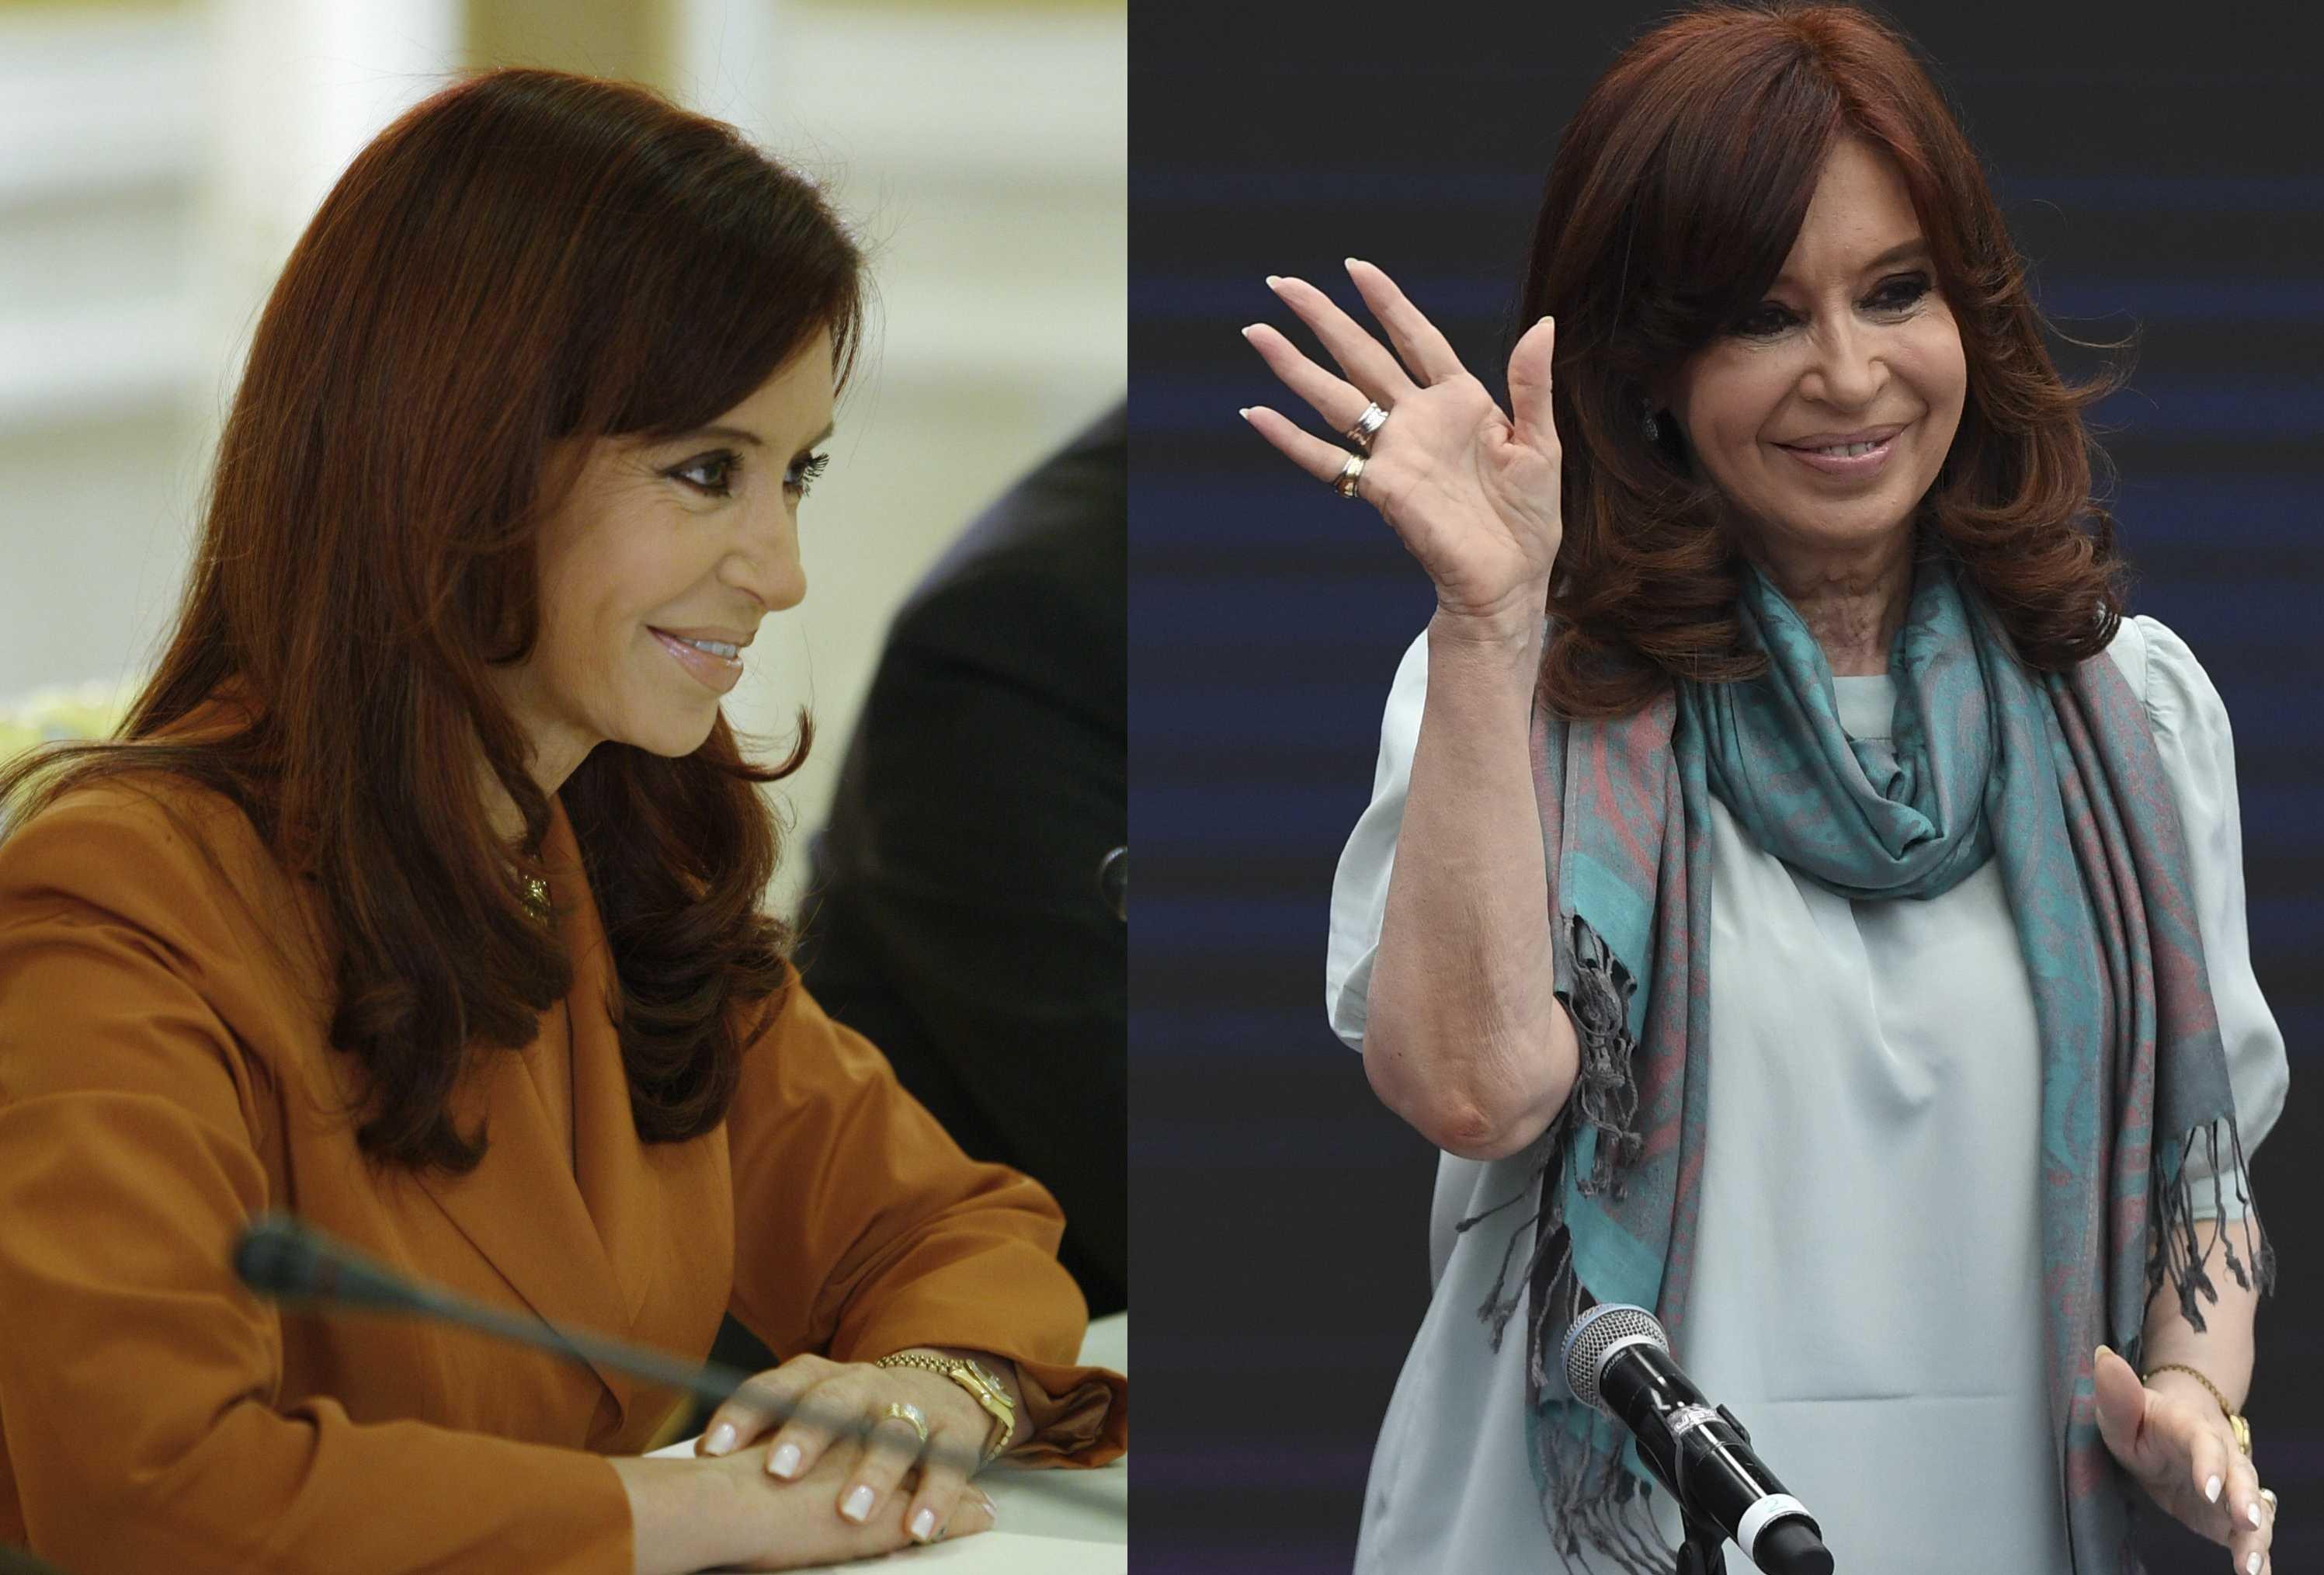 La expresidenta argentina Cristina Fernández de Kirchner, en el 2008 / 2018